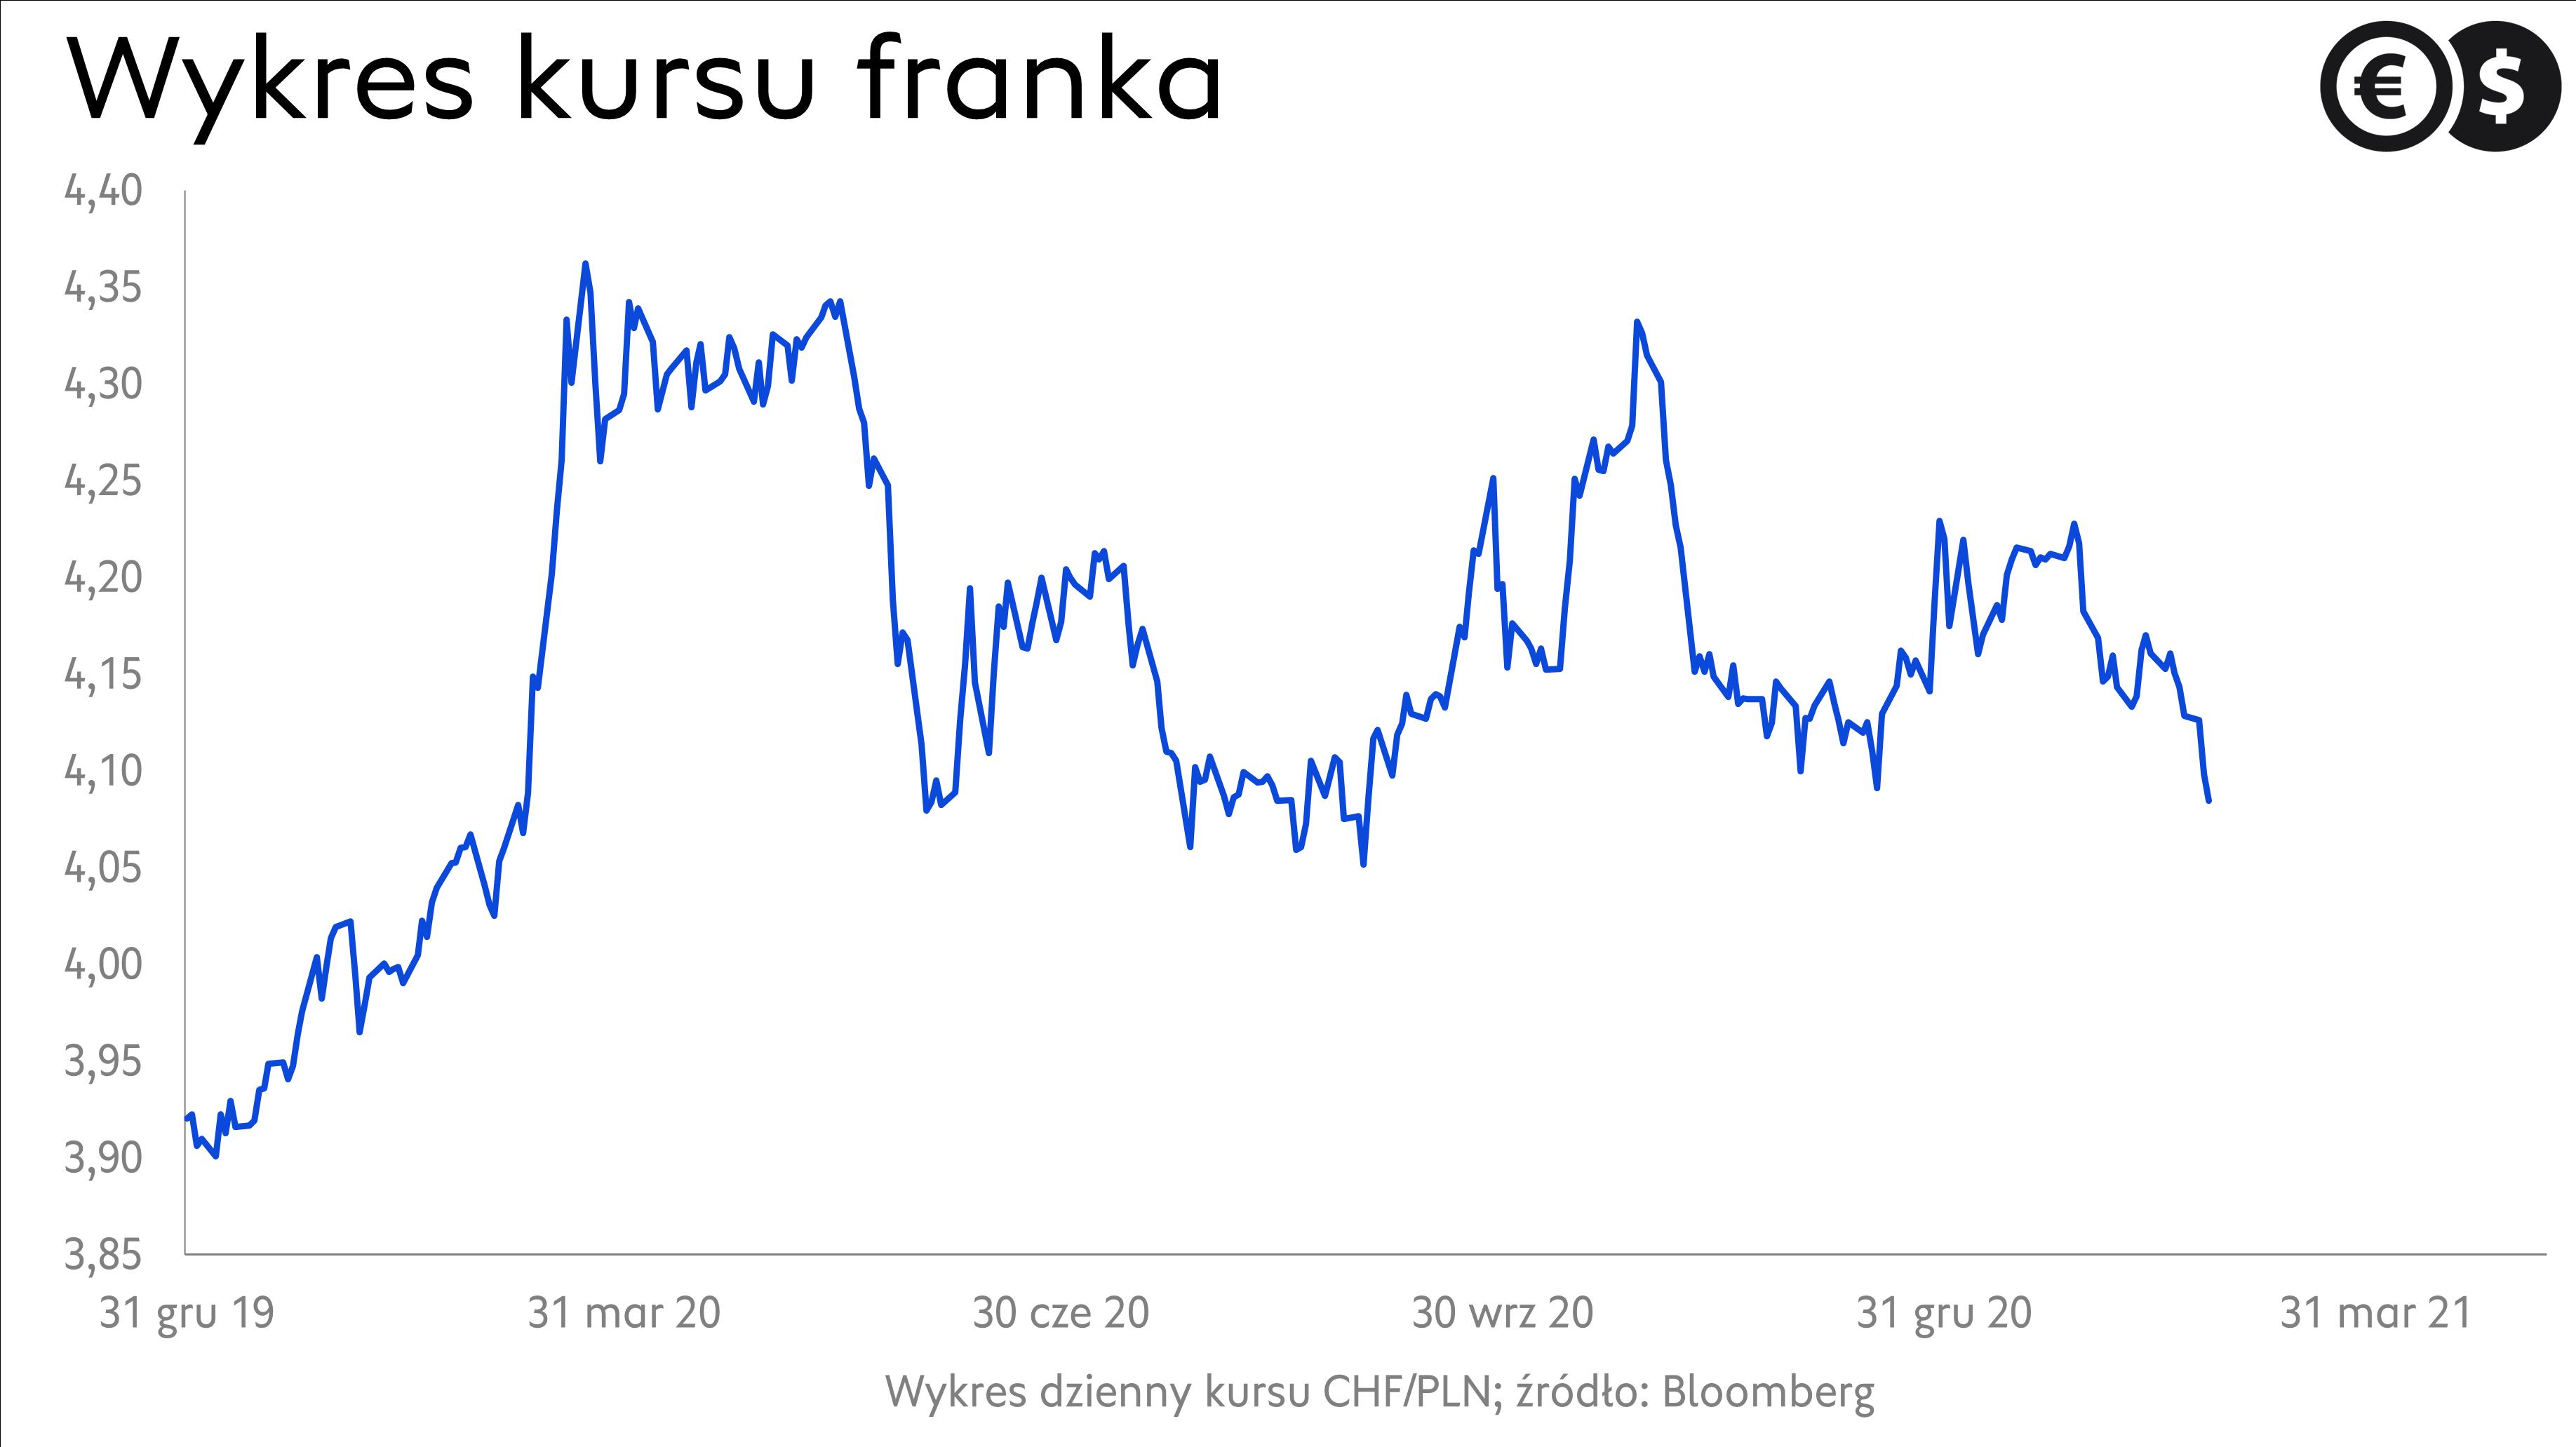 Wykres kursu franka